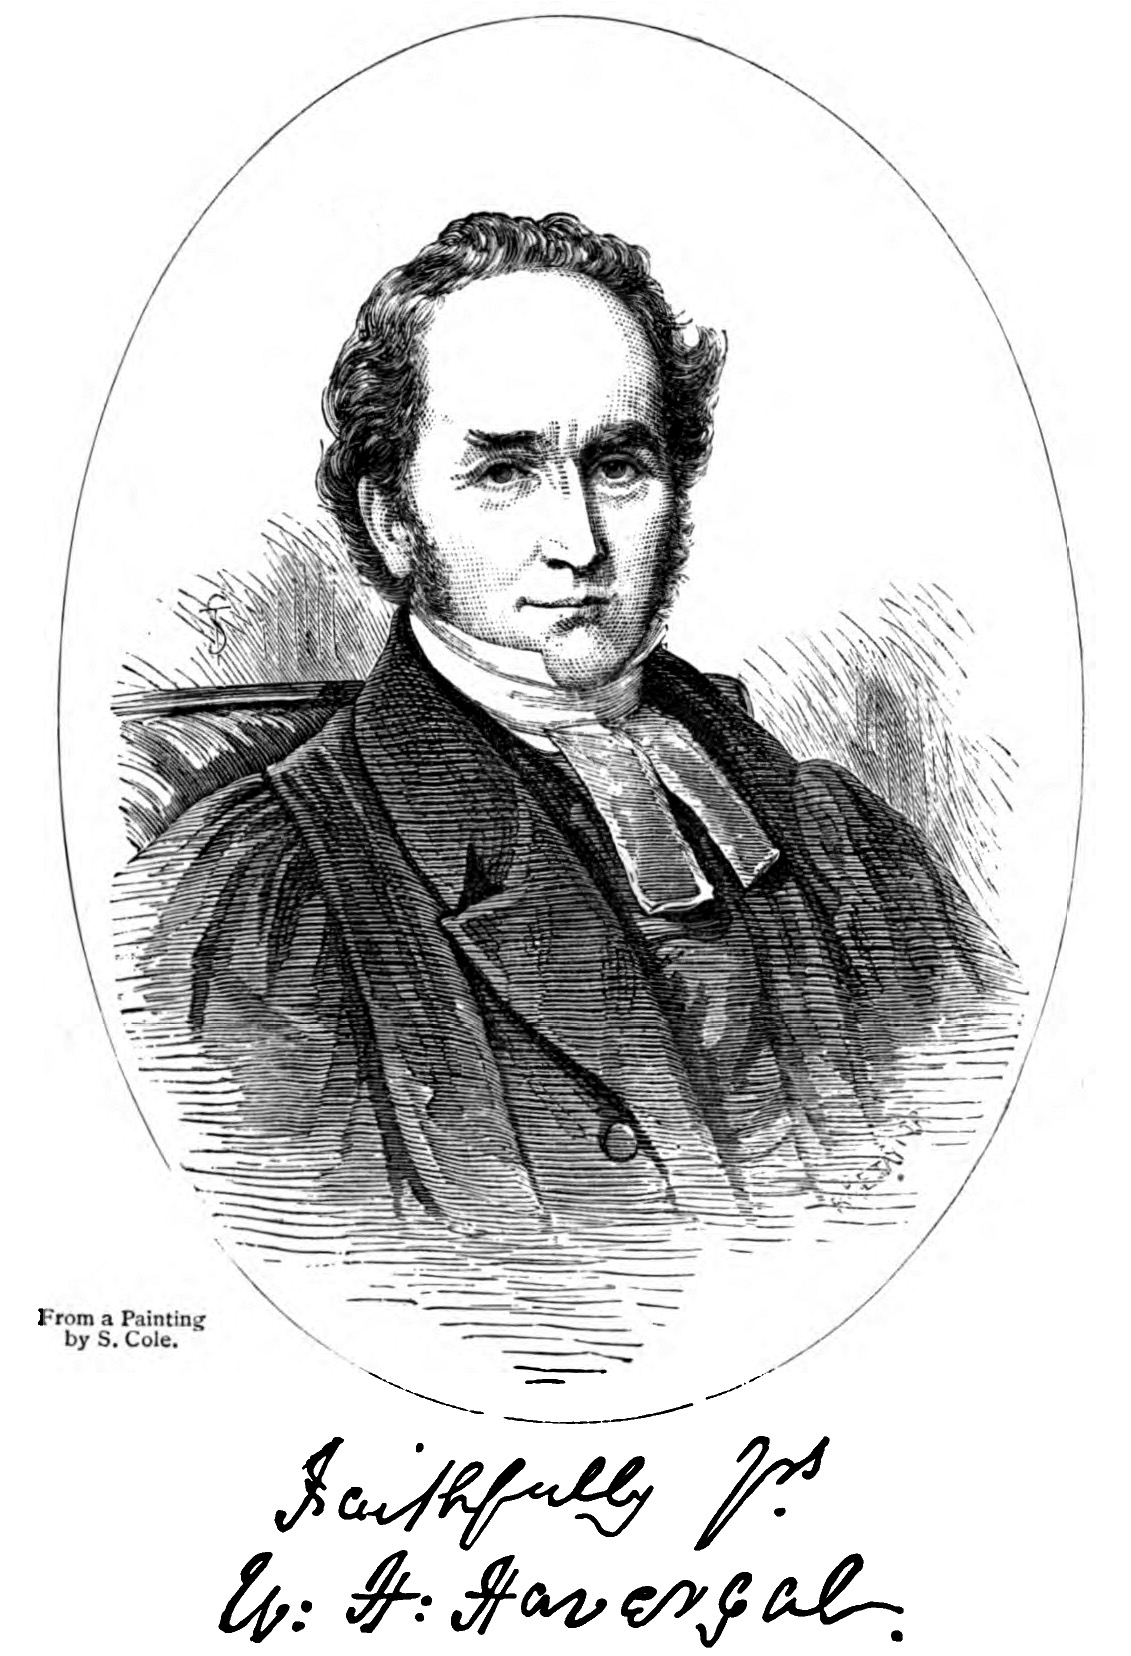 William Henry Havergal , in Jane Miriam Crane,  Records of the Life of the Rev. W.H. Havergal, M.A.  (1883).